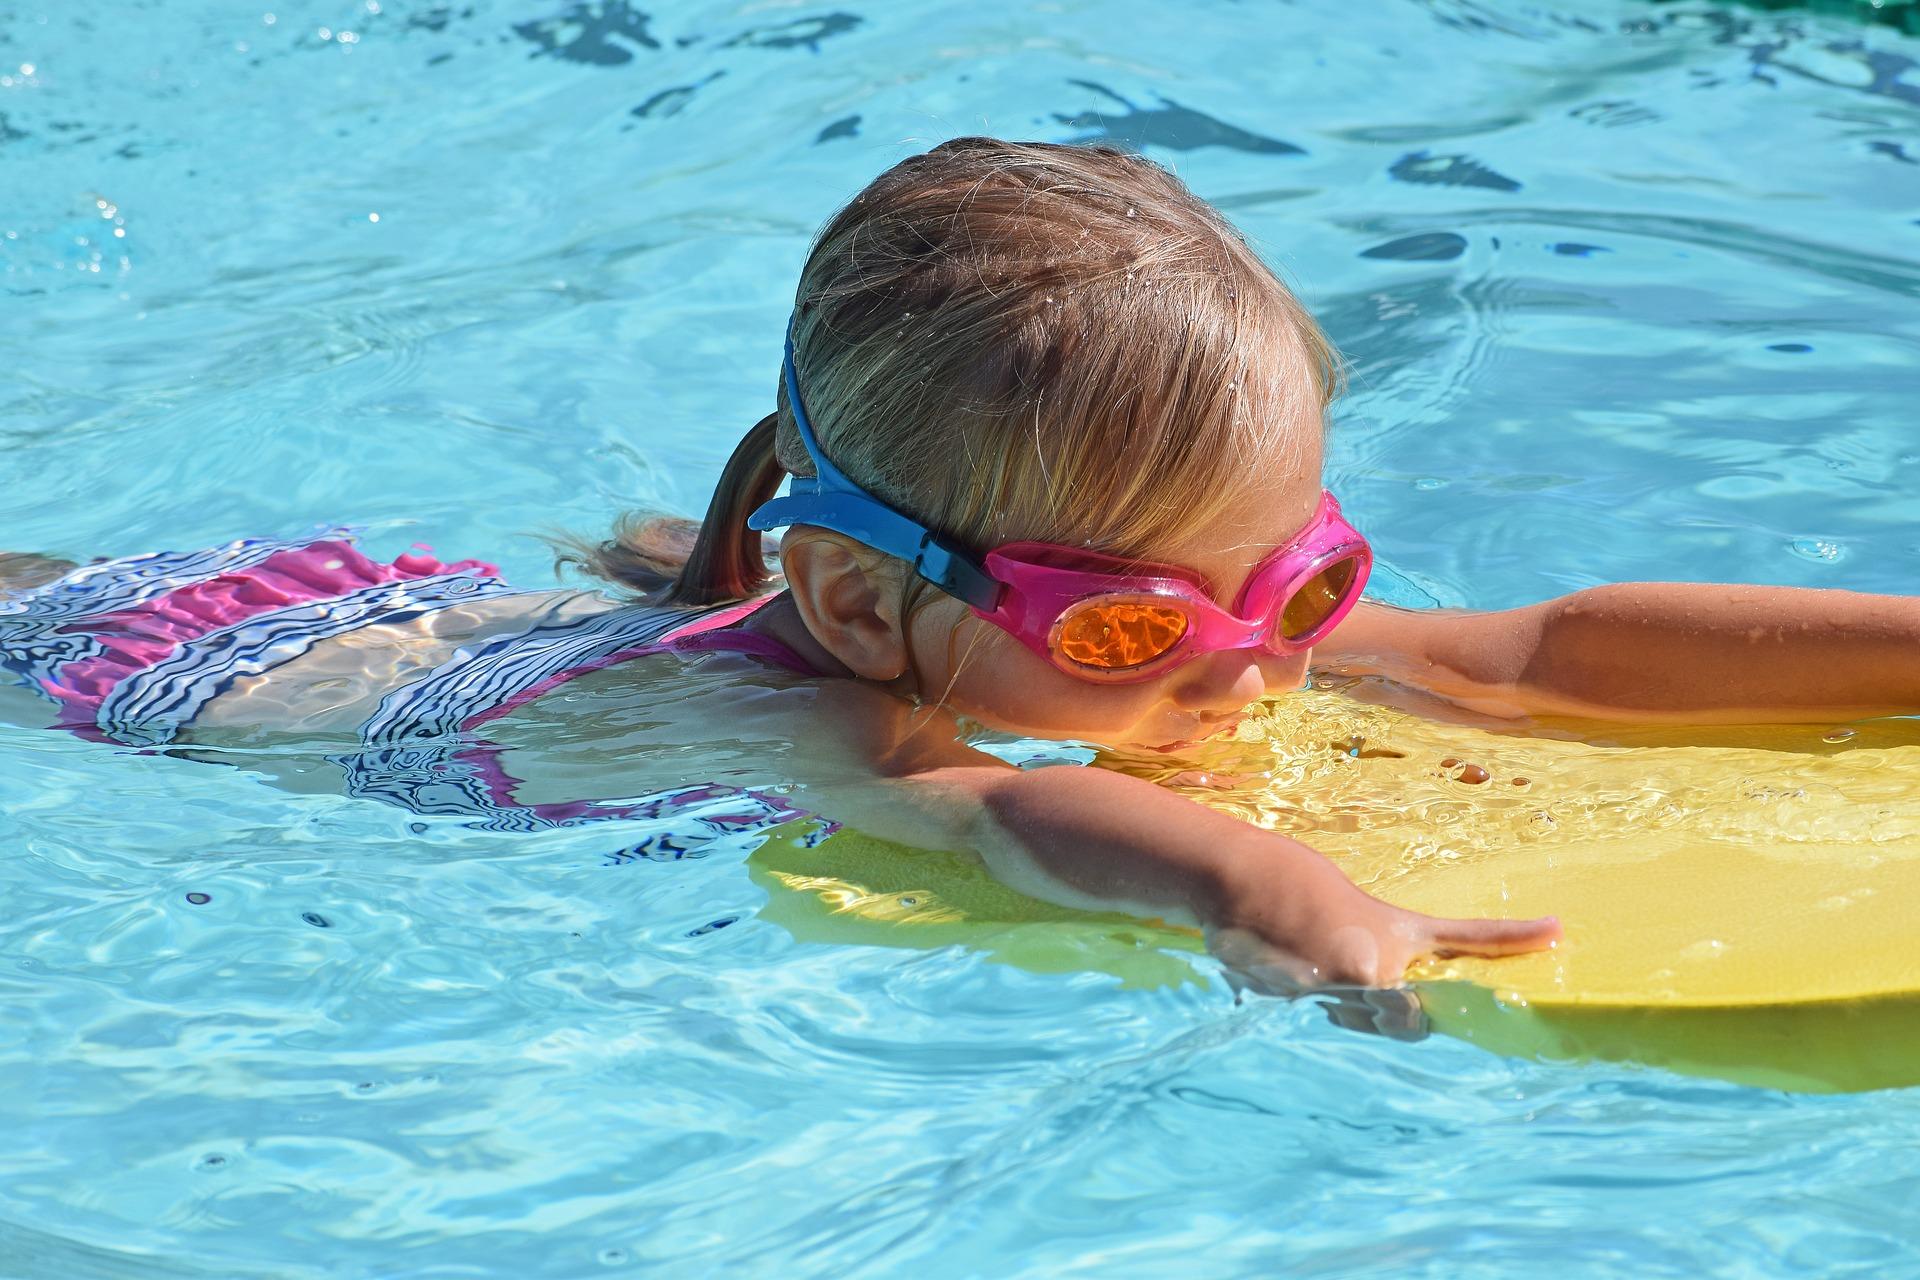 meilleure piscine hors sol